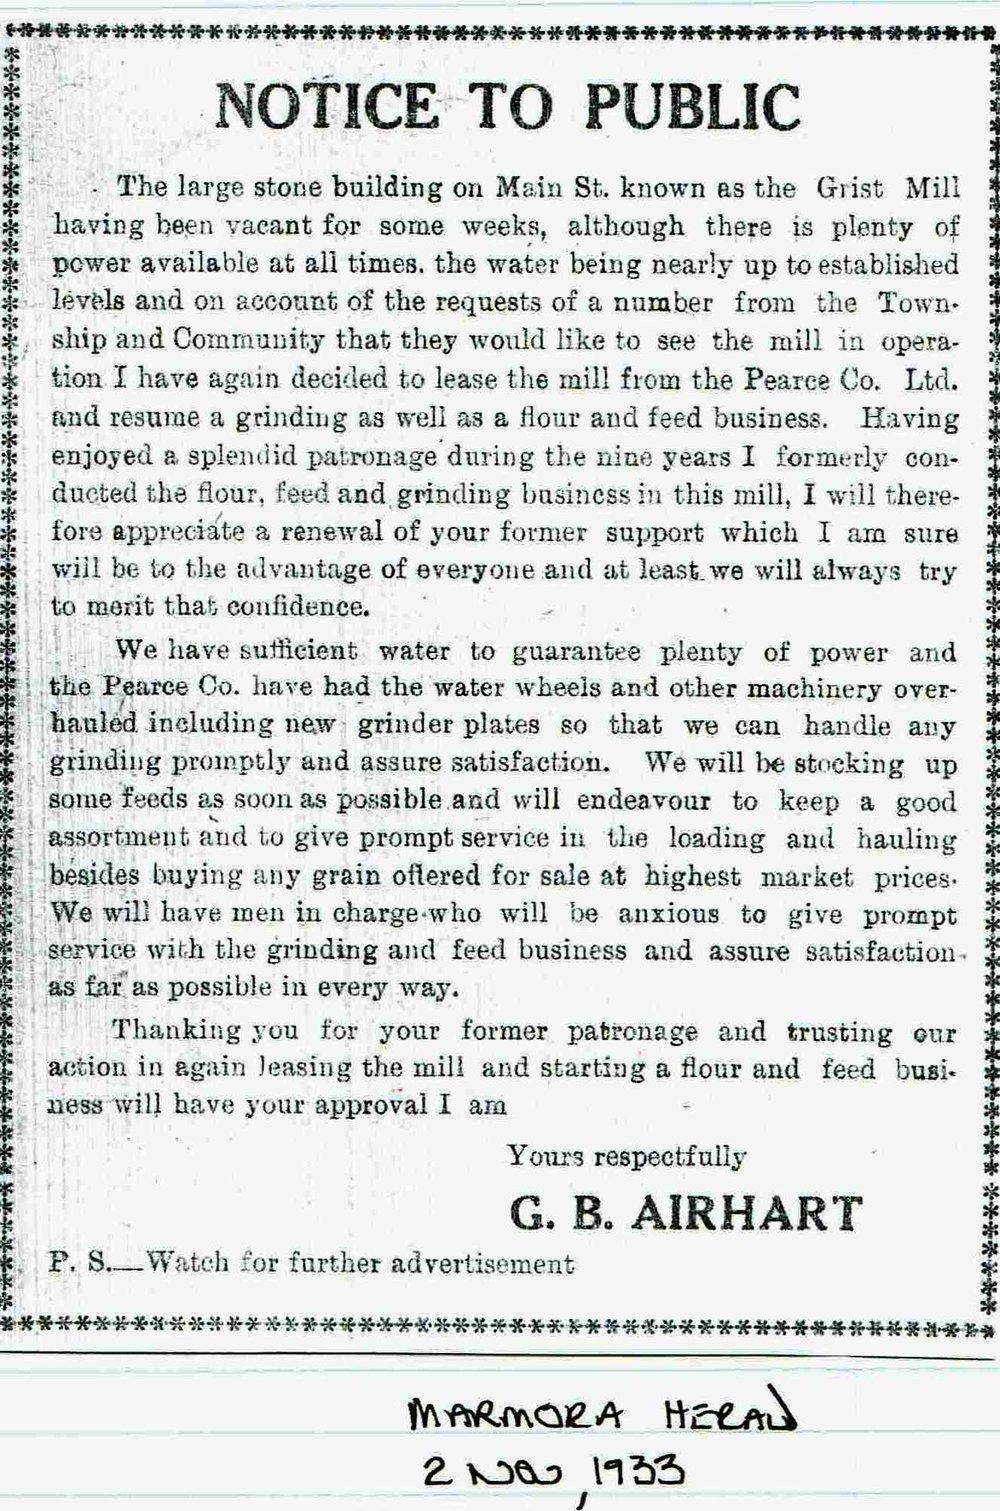 G.B. Airhart - Grist Mill 1933.JPG